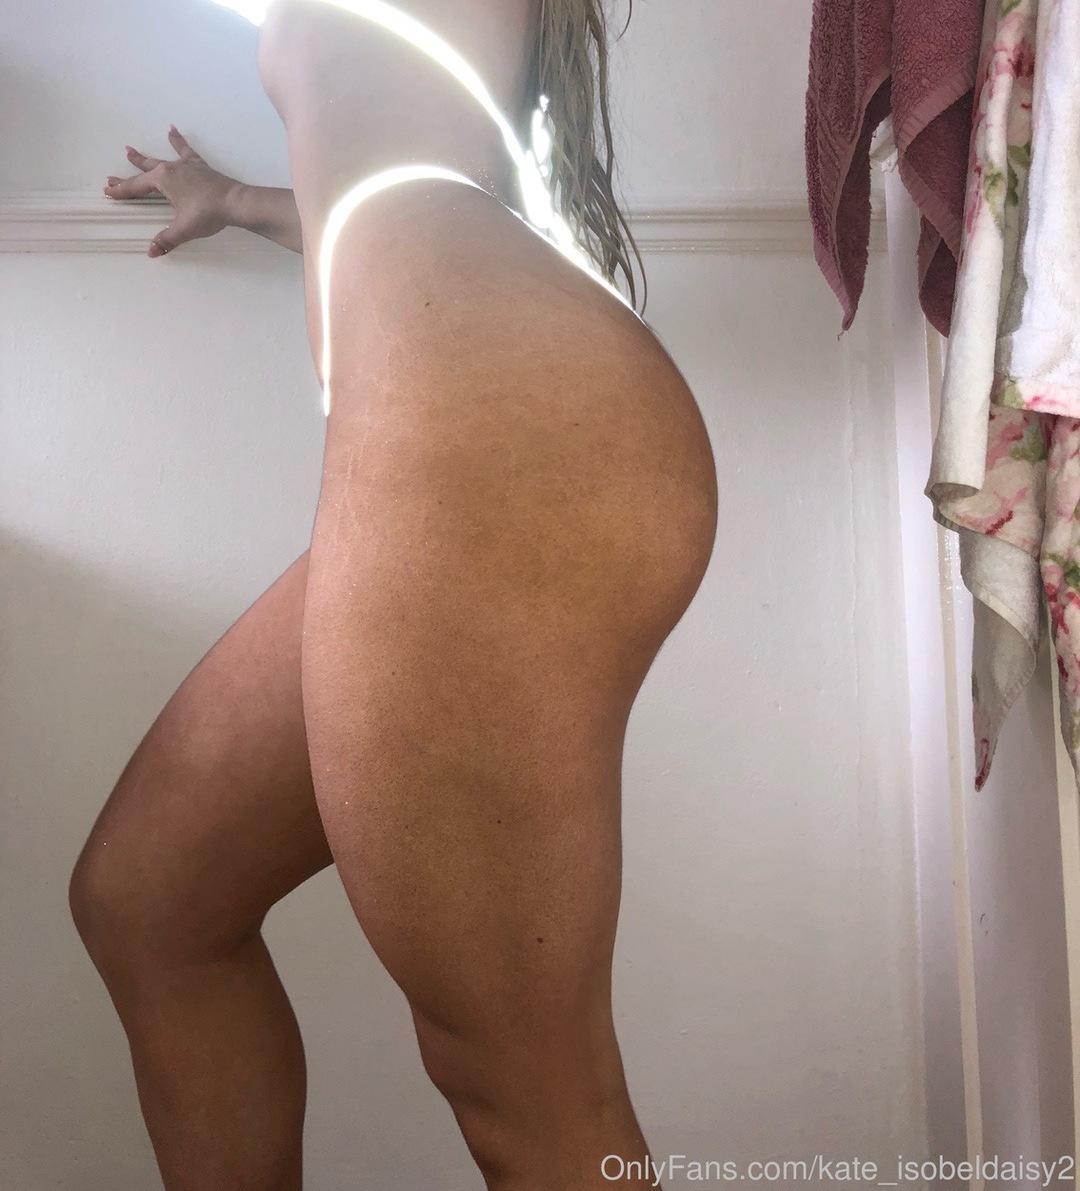 Kate Sharp Kate Isobel Onlyfans Nudes Leaks 0027